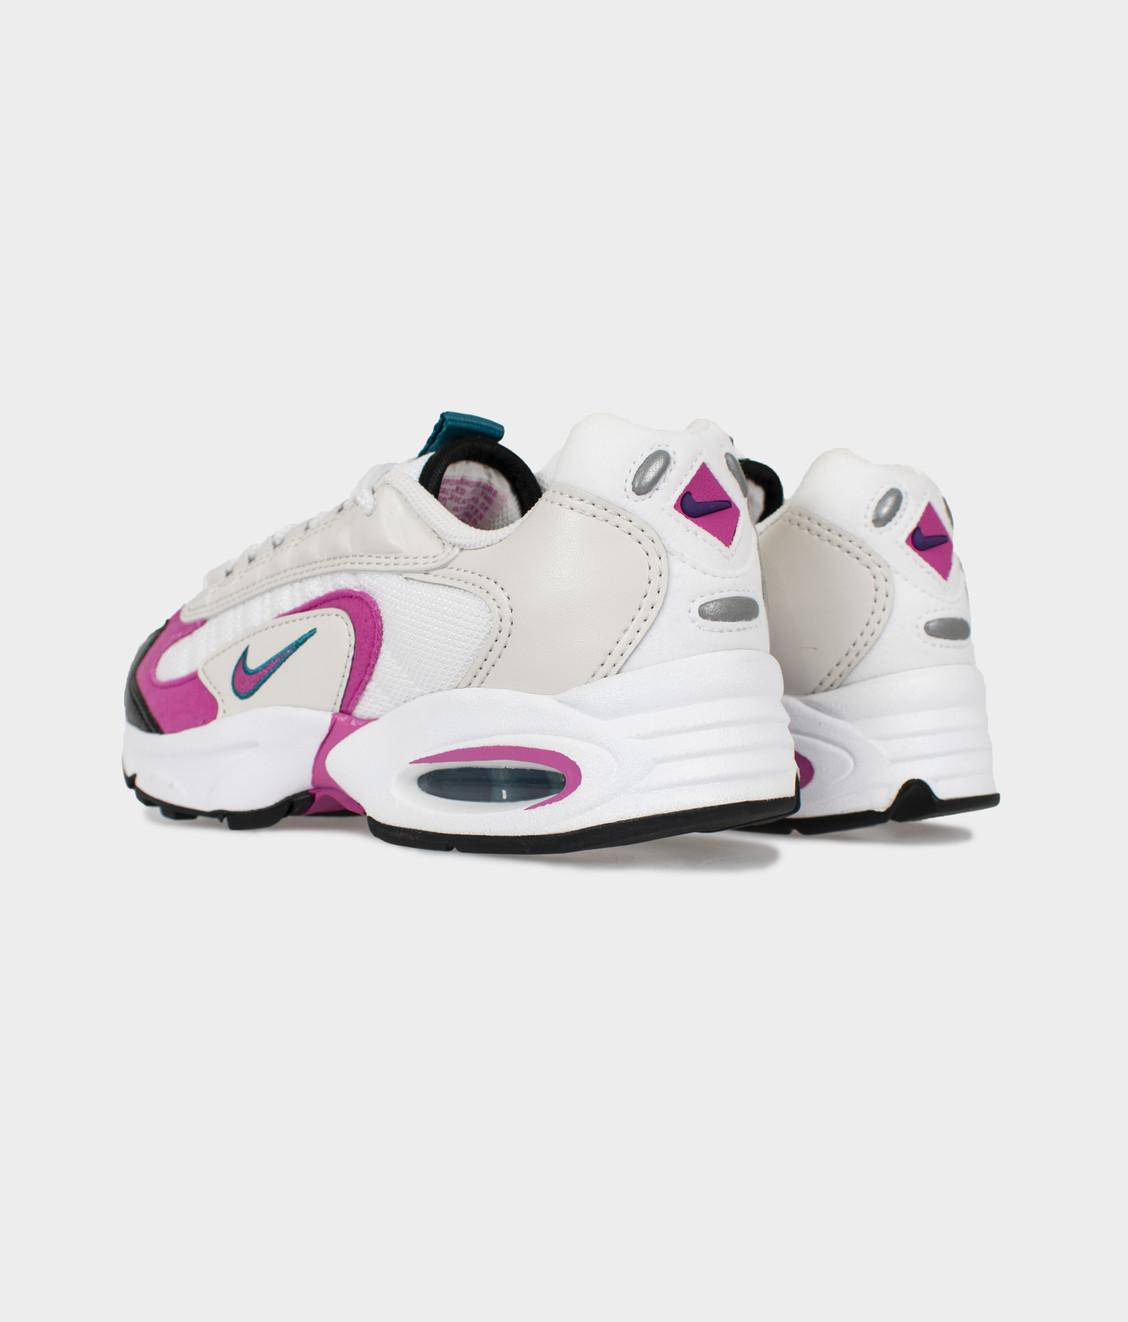 Nike Nike Air Max Triax White/Active Fuchsia